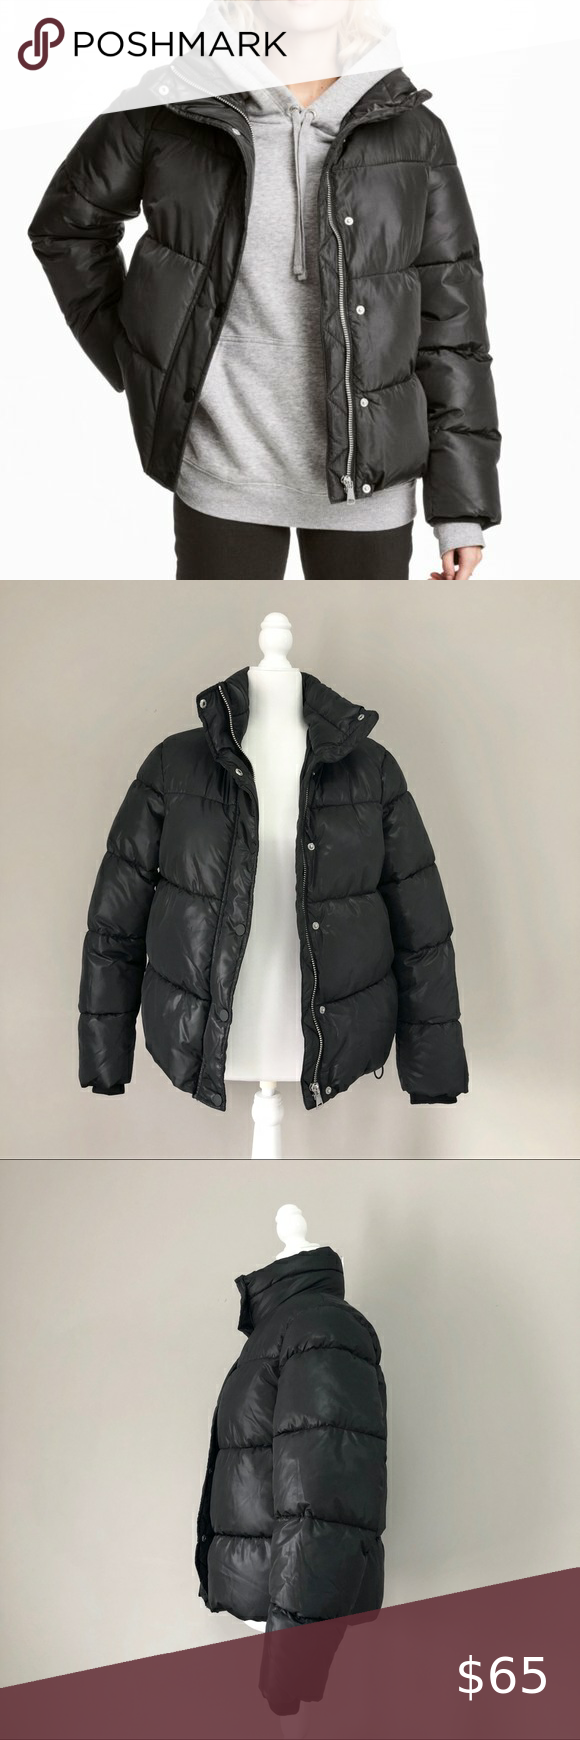 H M L O G G Black Oversized Puffer Jacket Coat 6 Oversized Puffer Jacket Jackets Puffer Jackets [ 1740 x 580 Pixel ]